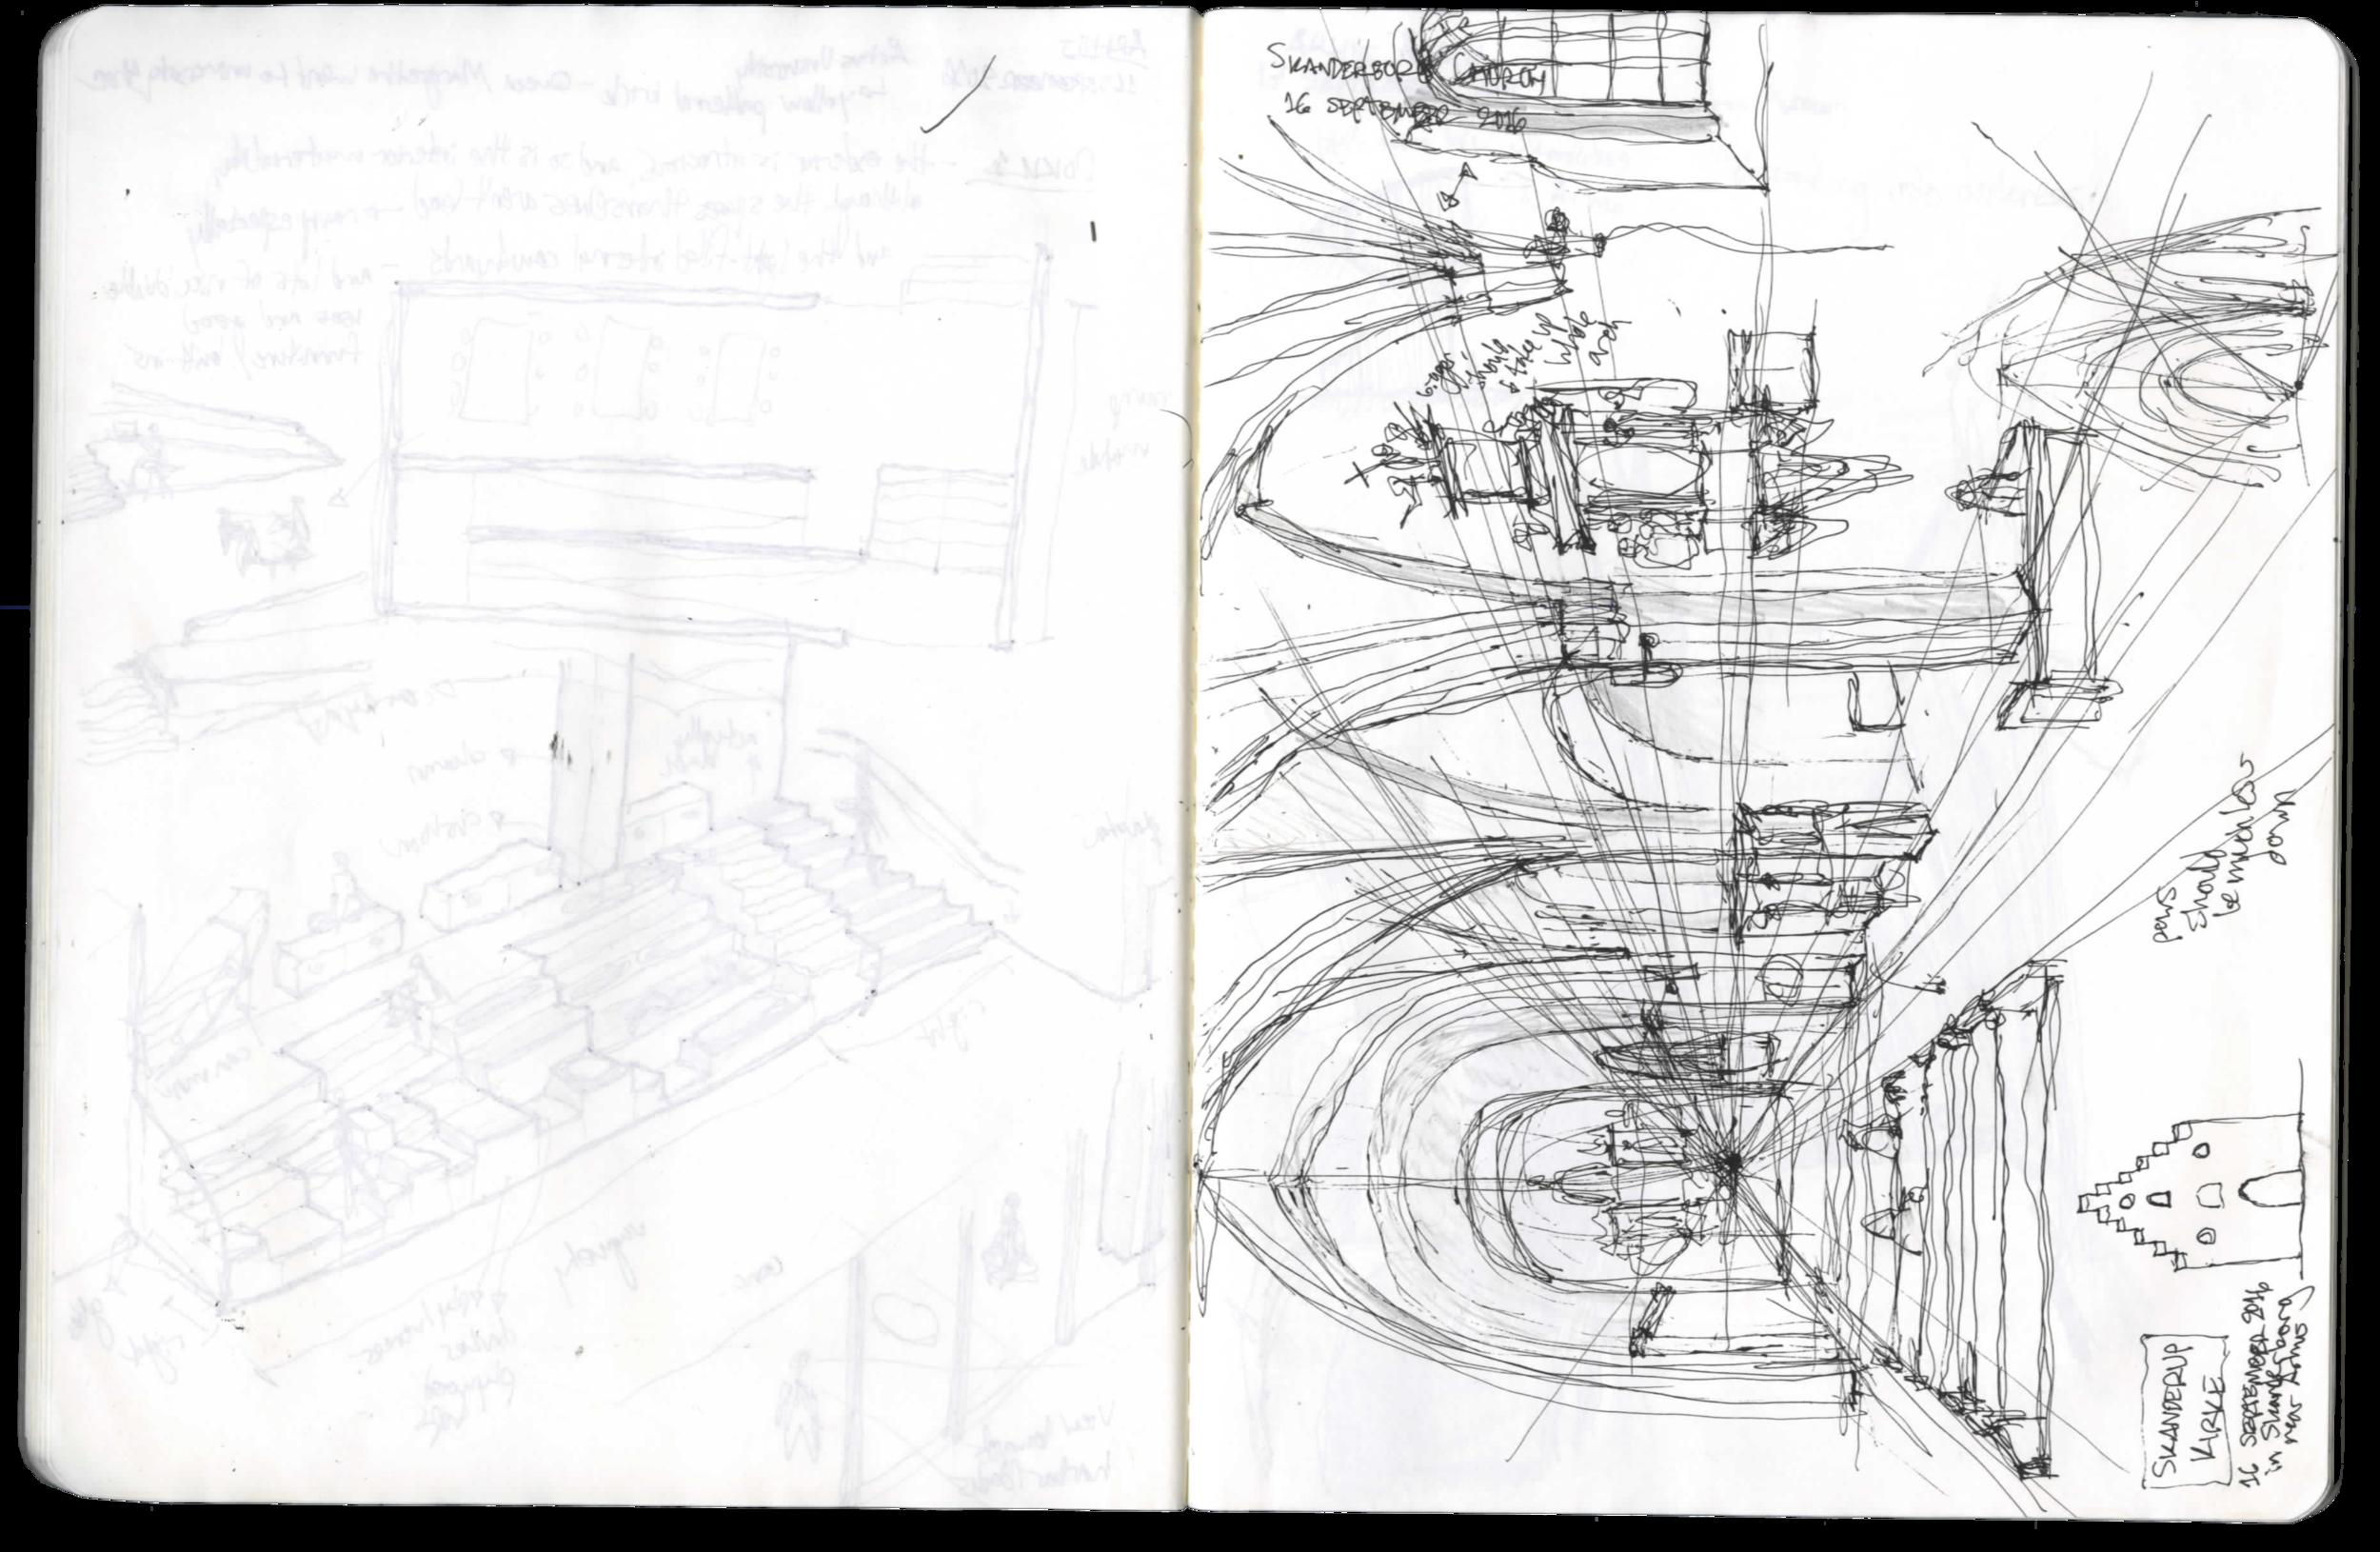 Mark_Terra-Salomão_Scandinavia_Sketchbook-7.png